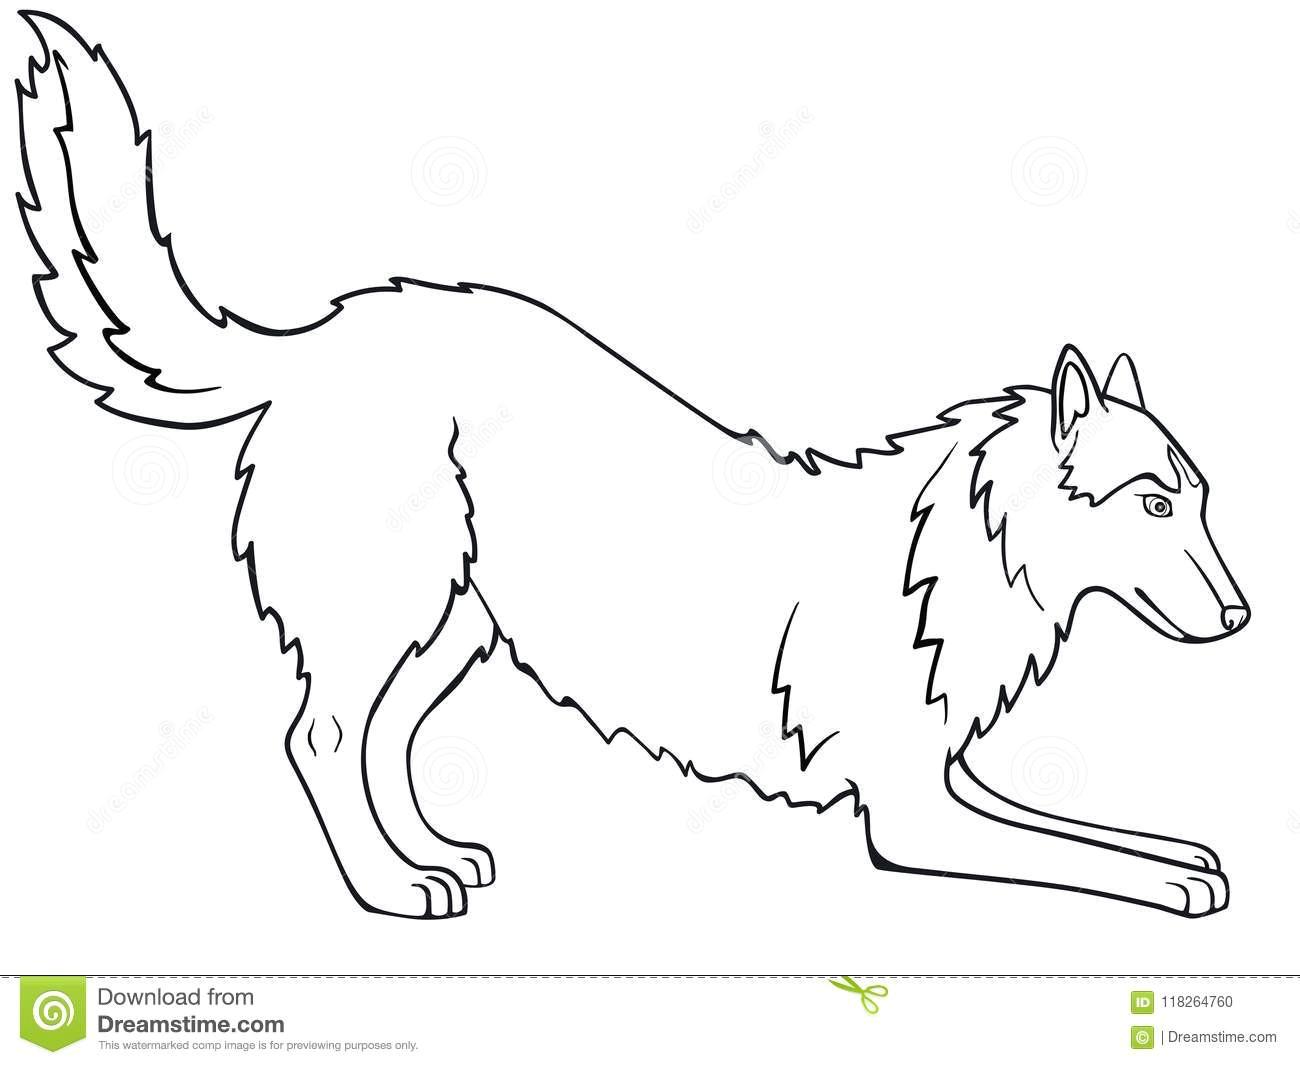 Easy Drawings Husky Siberian Husky Alaskan Malamute the Dog is Playing Line Drawing